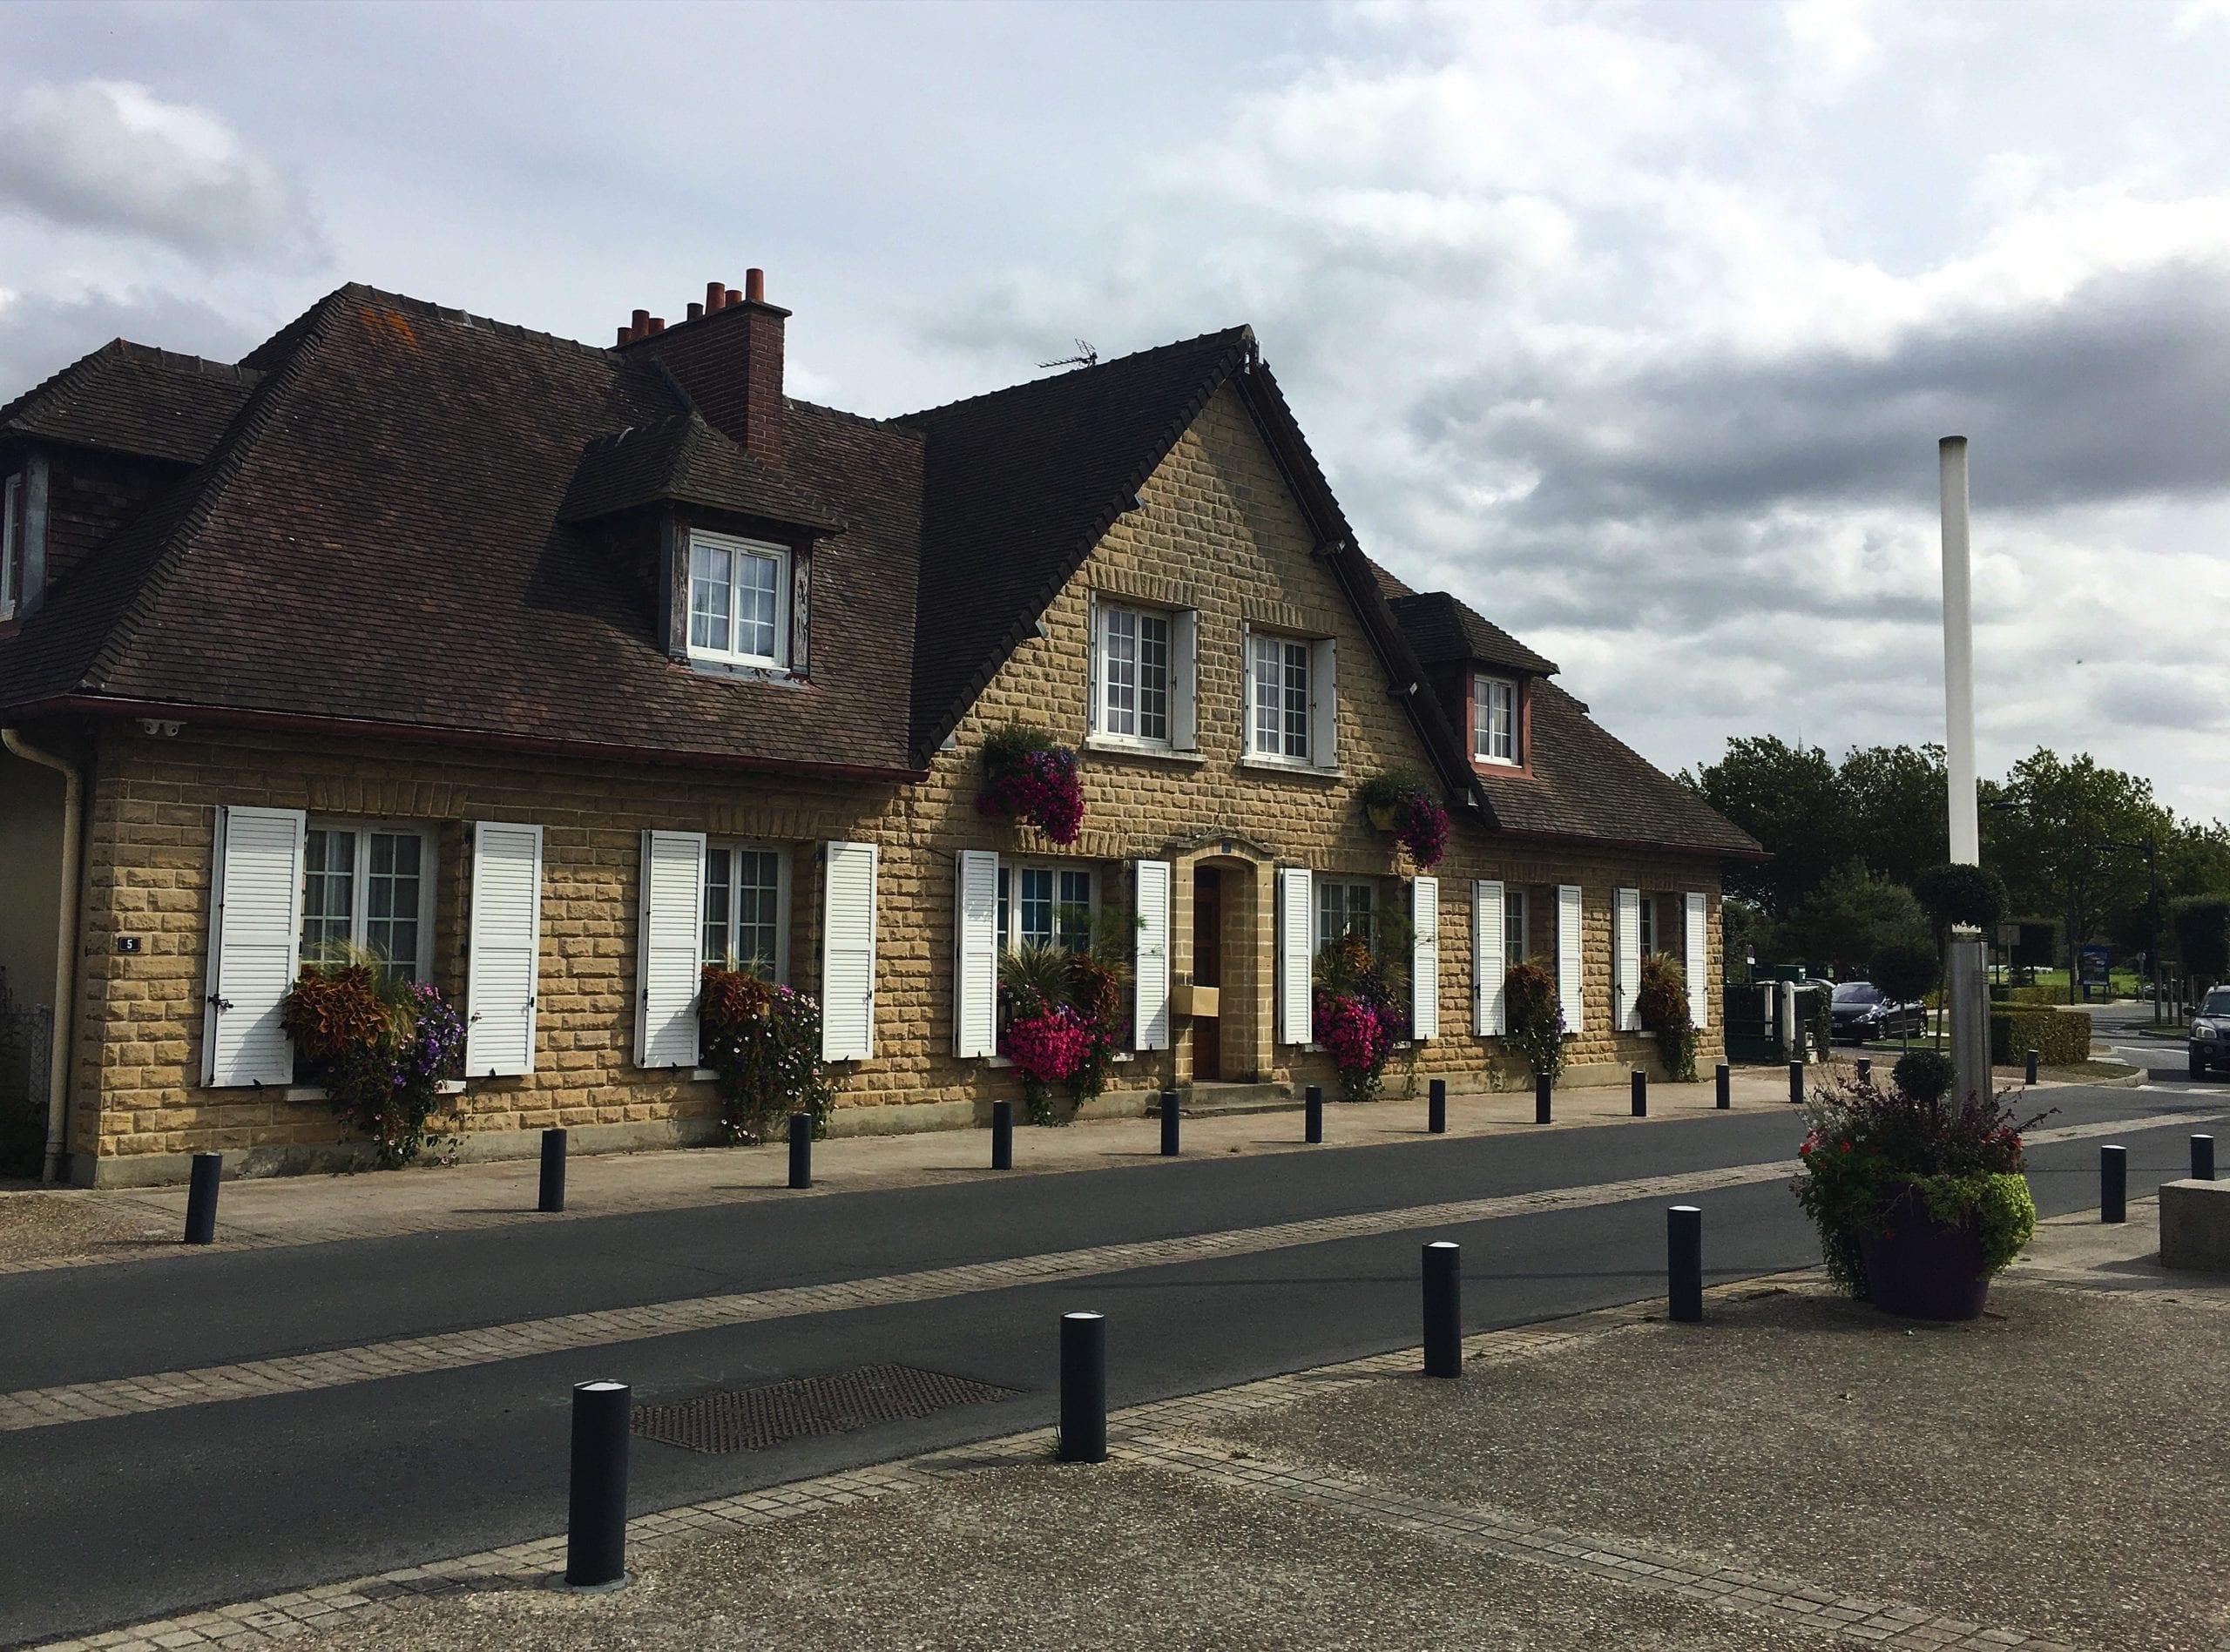 Houses in Merville-Franceville-Plage